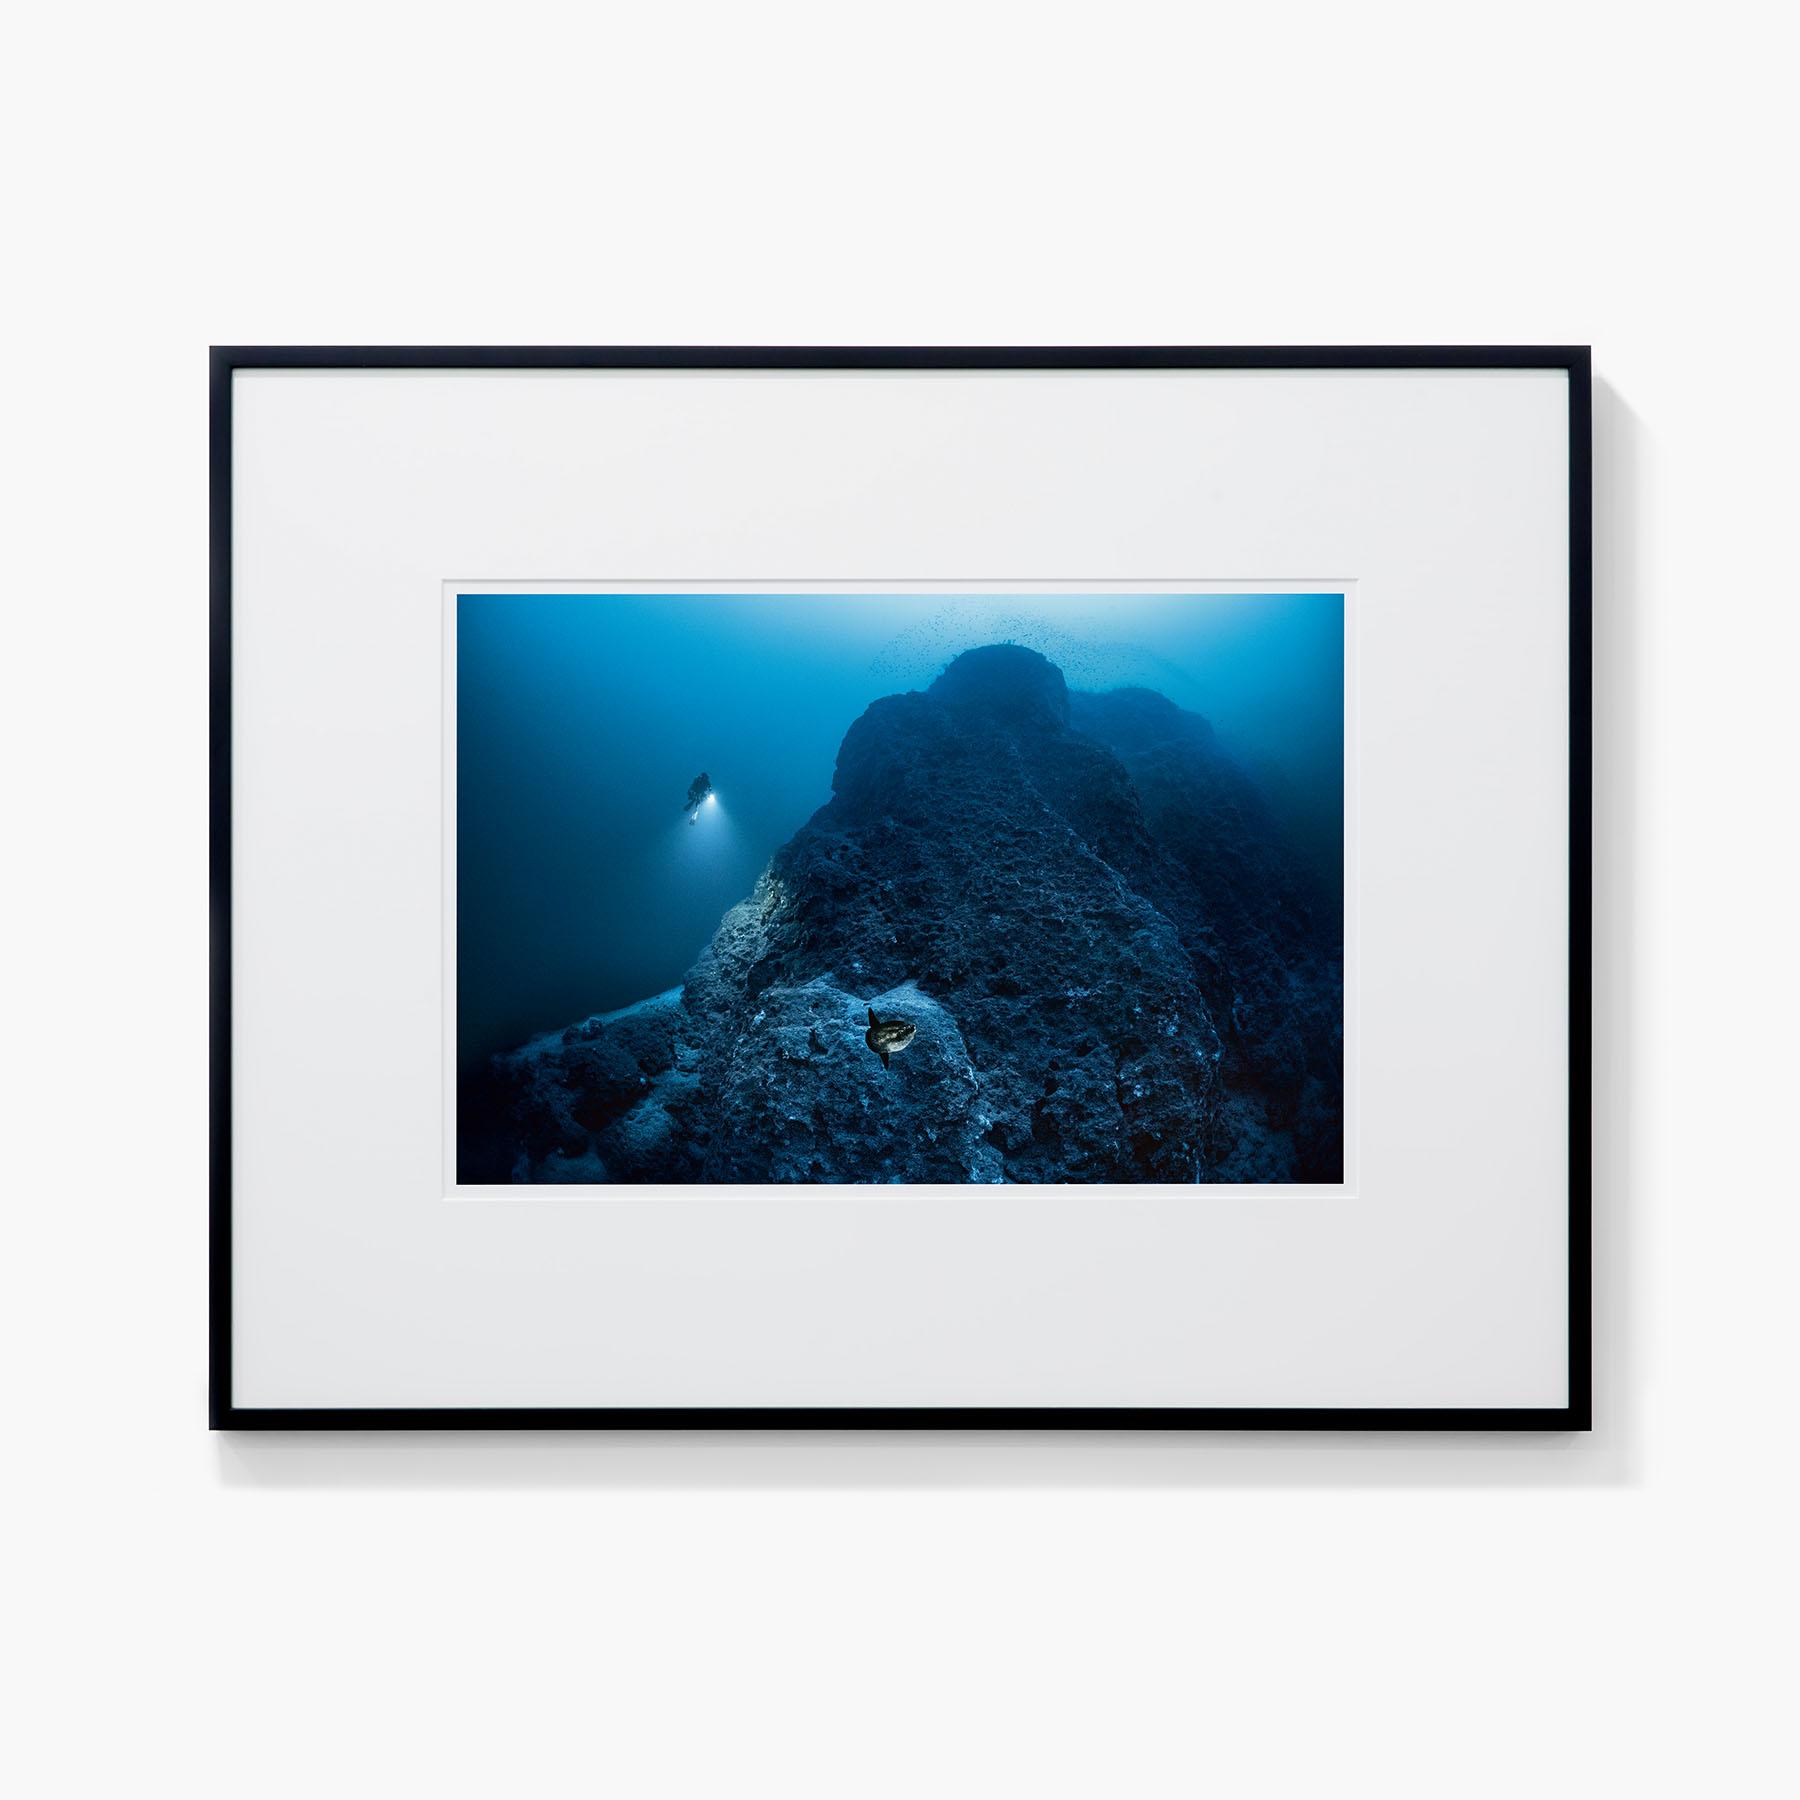 Tirage Laurent Ballesta Le poisson lune, Mola mola